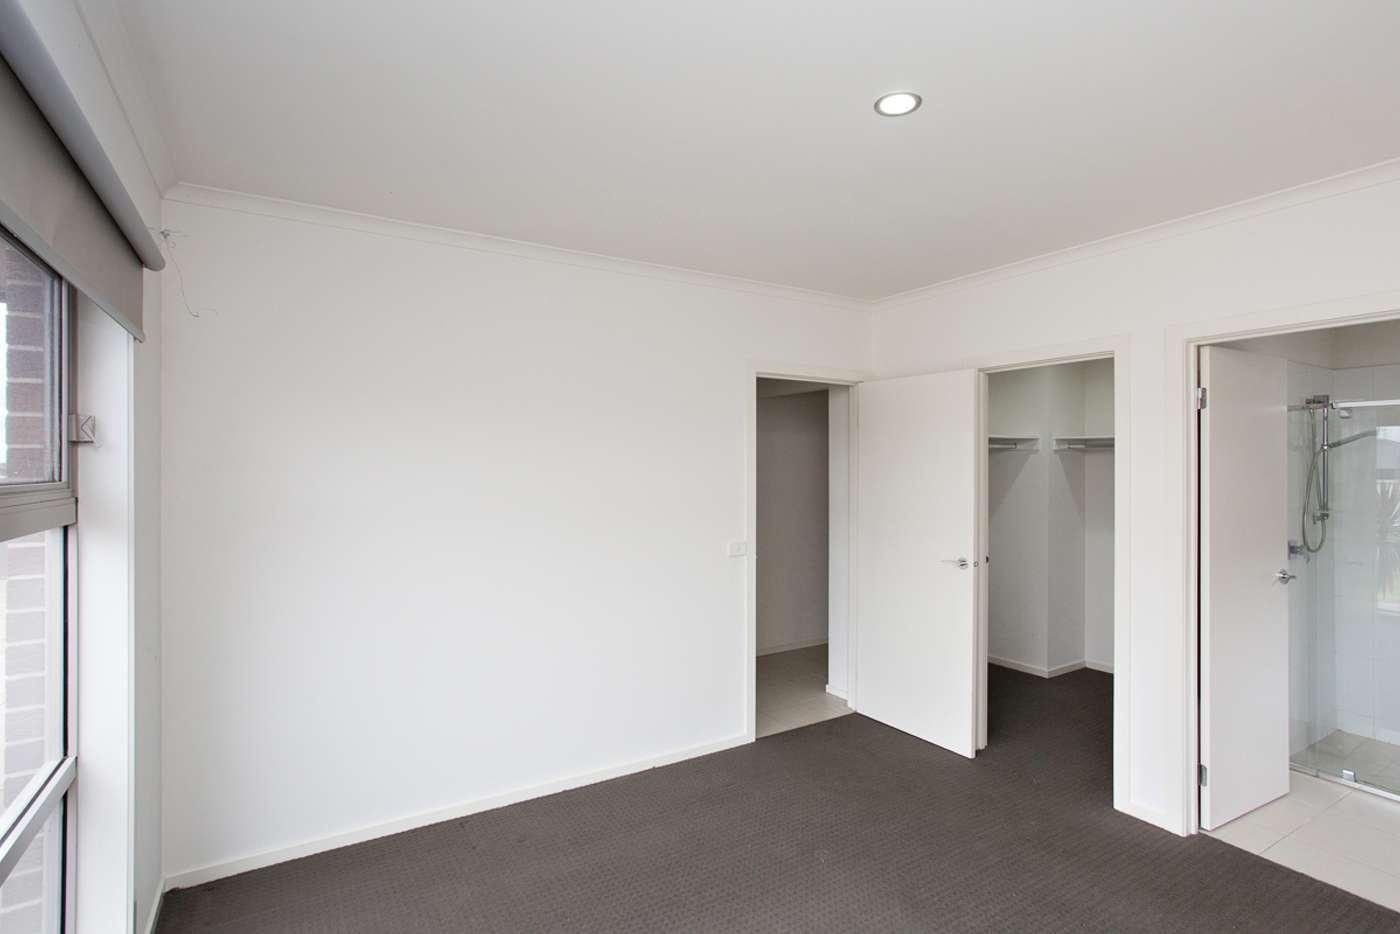 Seventh view of Homely house listing, 210 Walker Street, Sebastopol VIC 3356